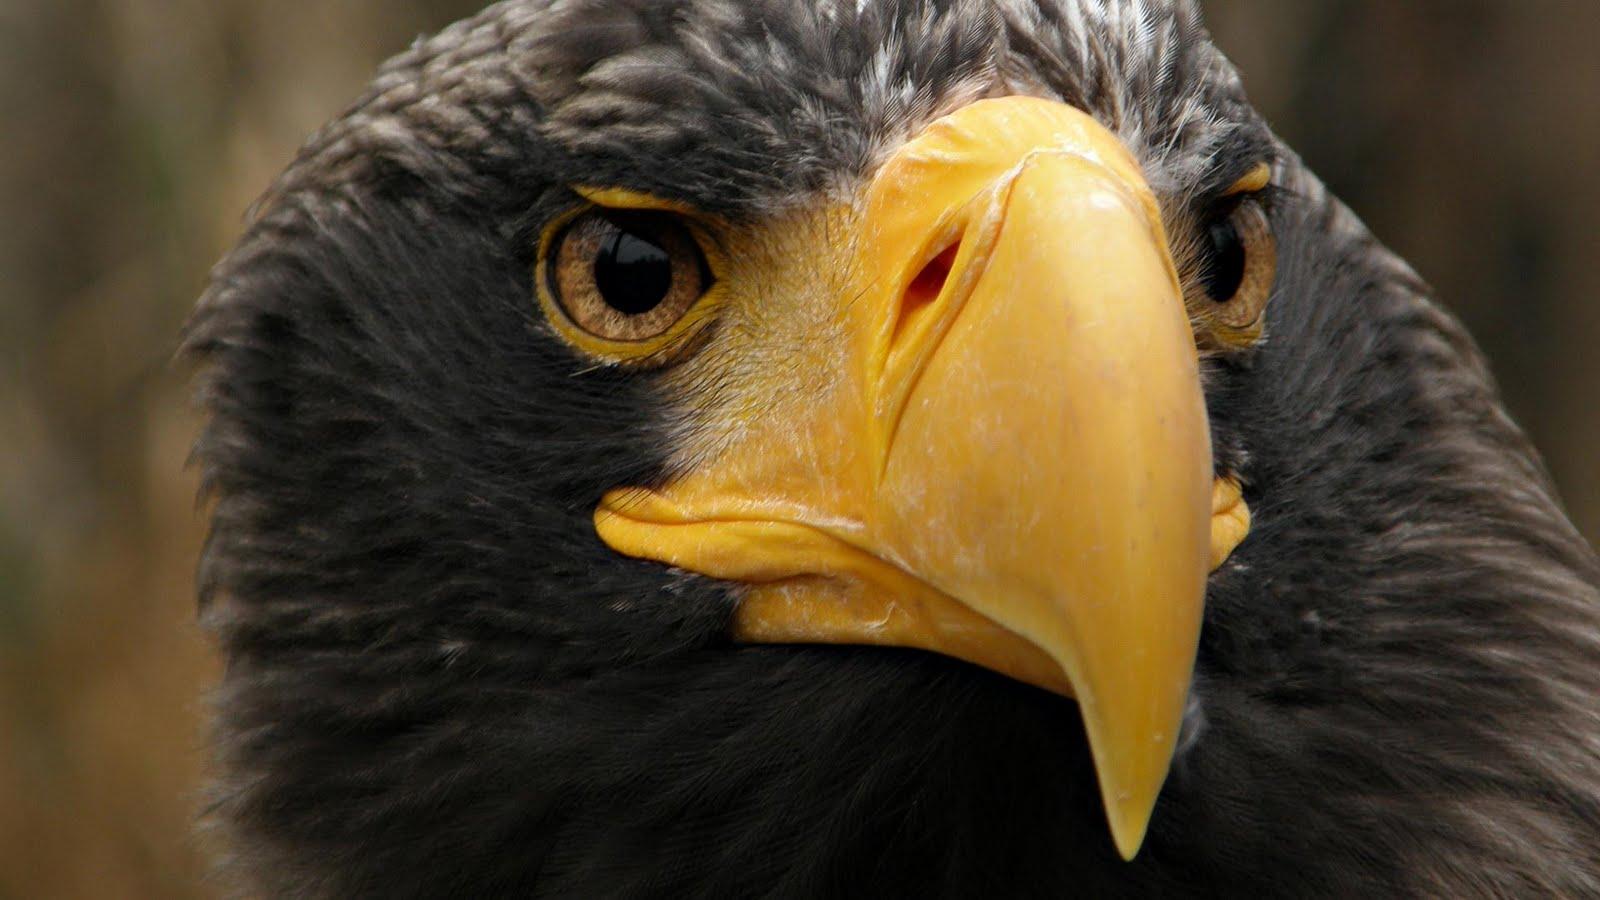 Wonderful Wallpaper Horse Eagle - 16950-desktop-wallpapers-eagle  Picture_52616.jpg